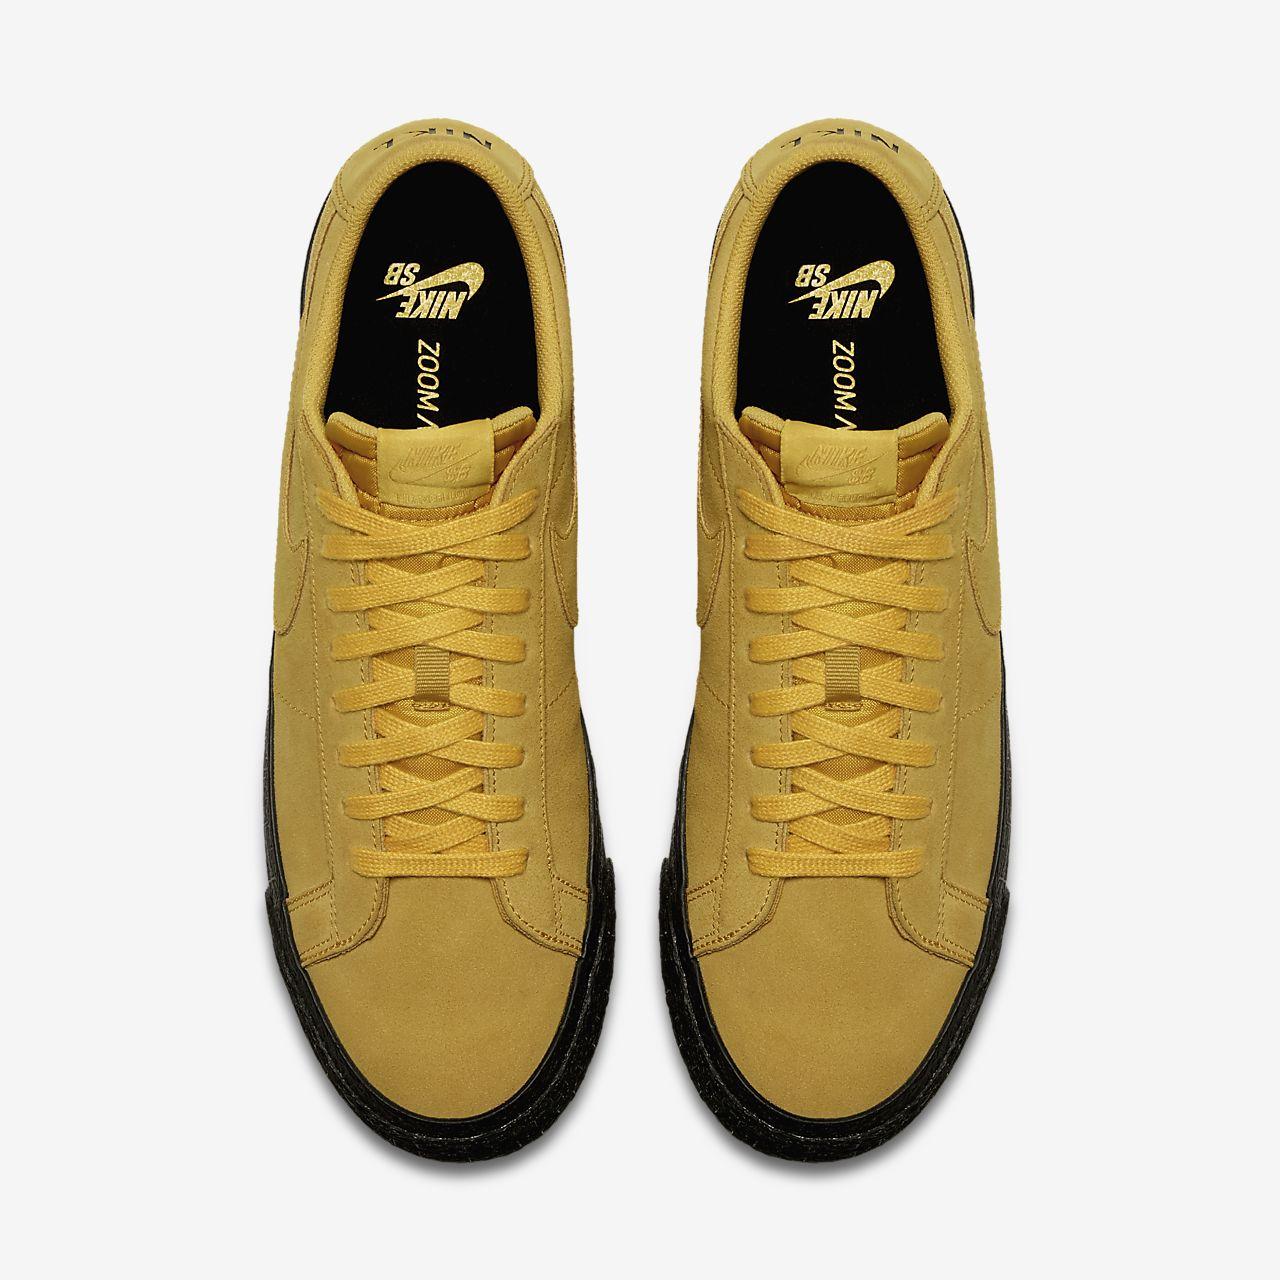 245a5c1bc915 sb-blazer-zoom-low-skateboarding-shoe-pogNGE.jpg